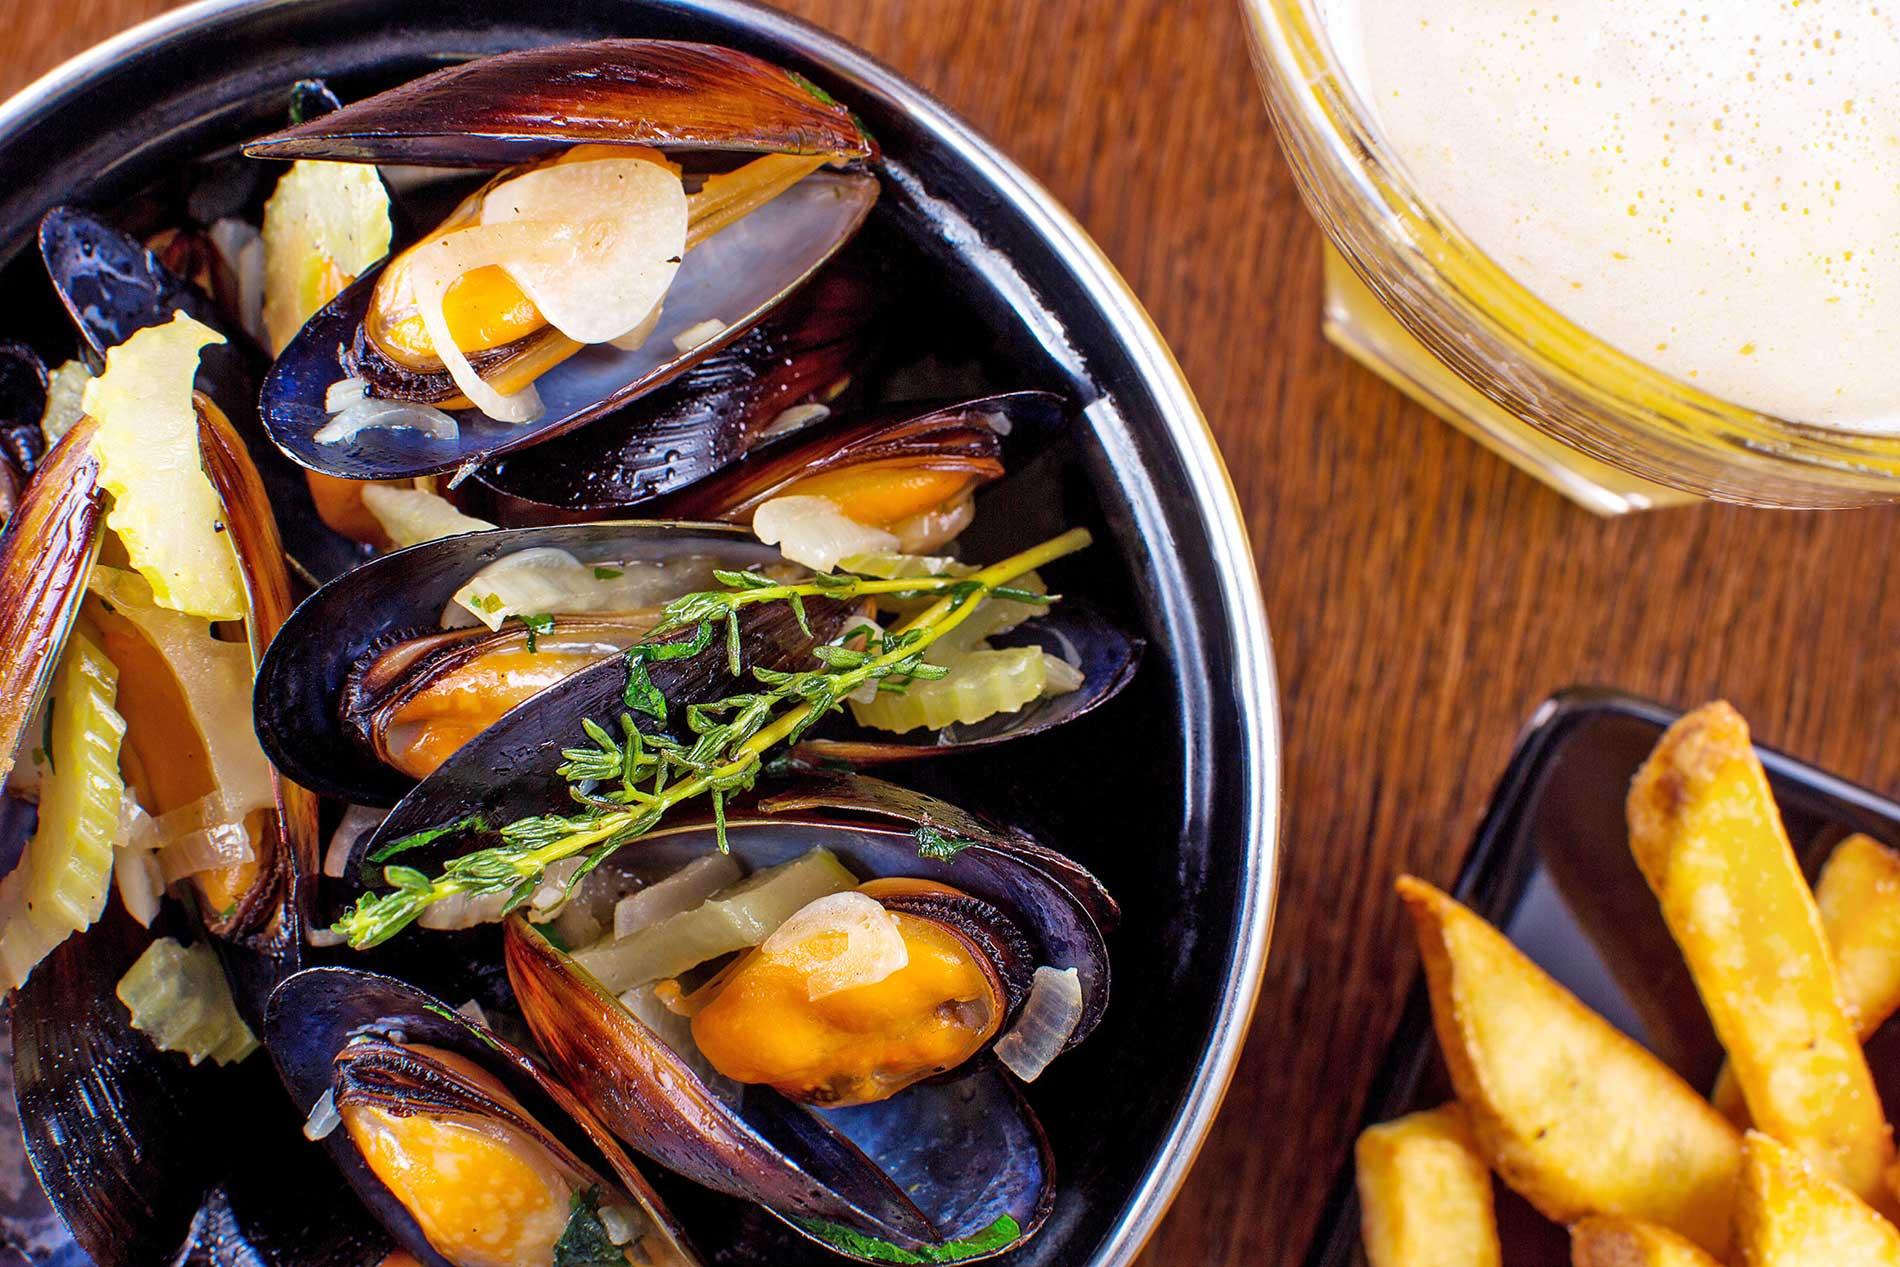 033_slide_mussels